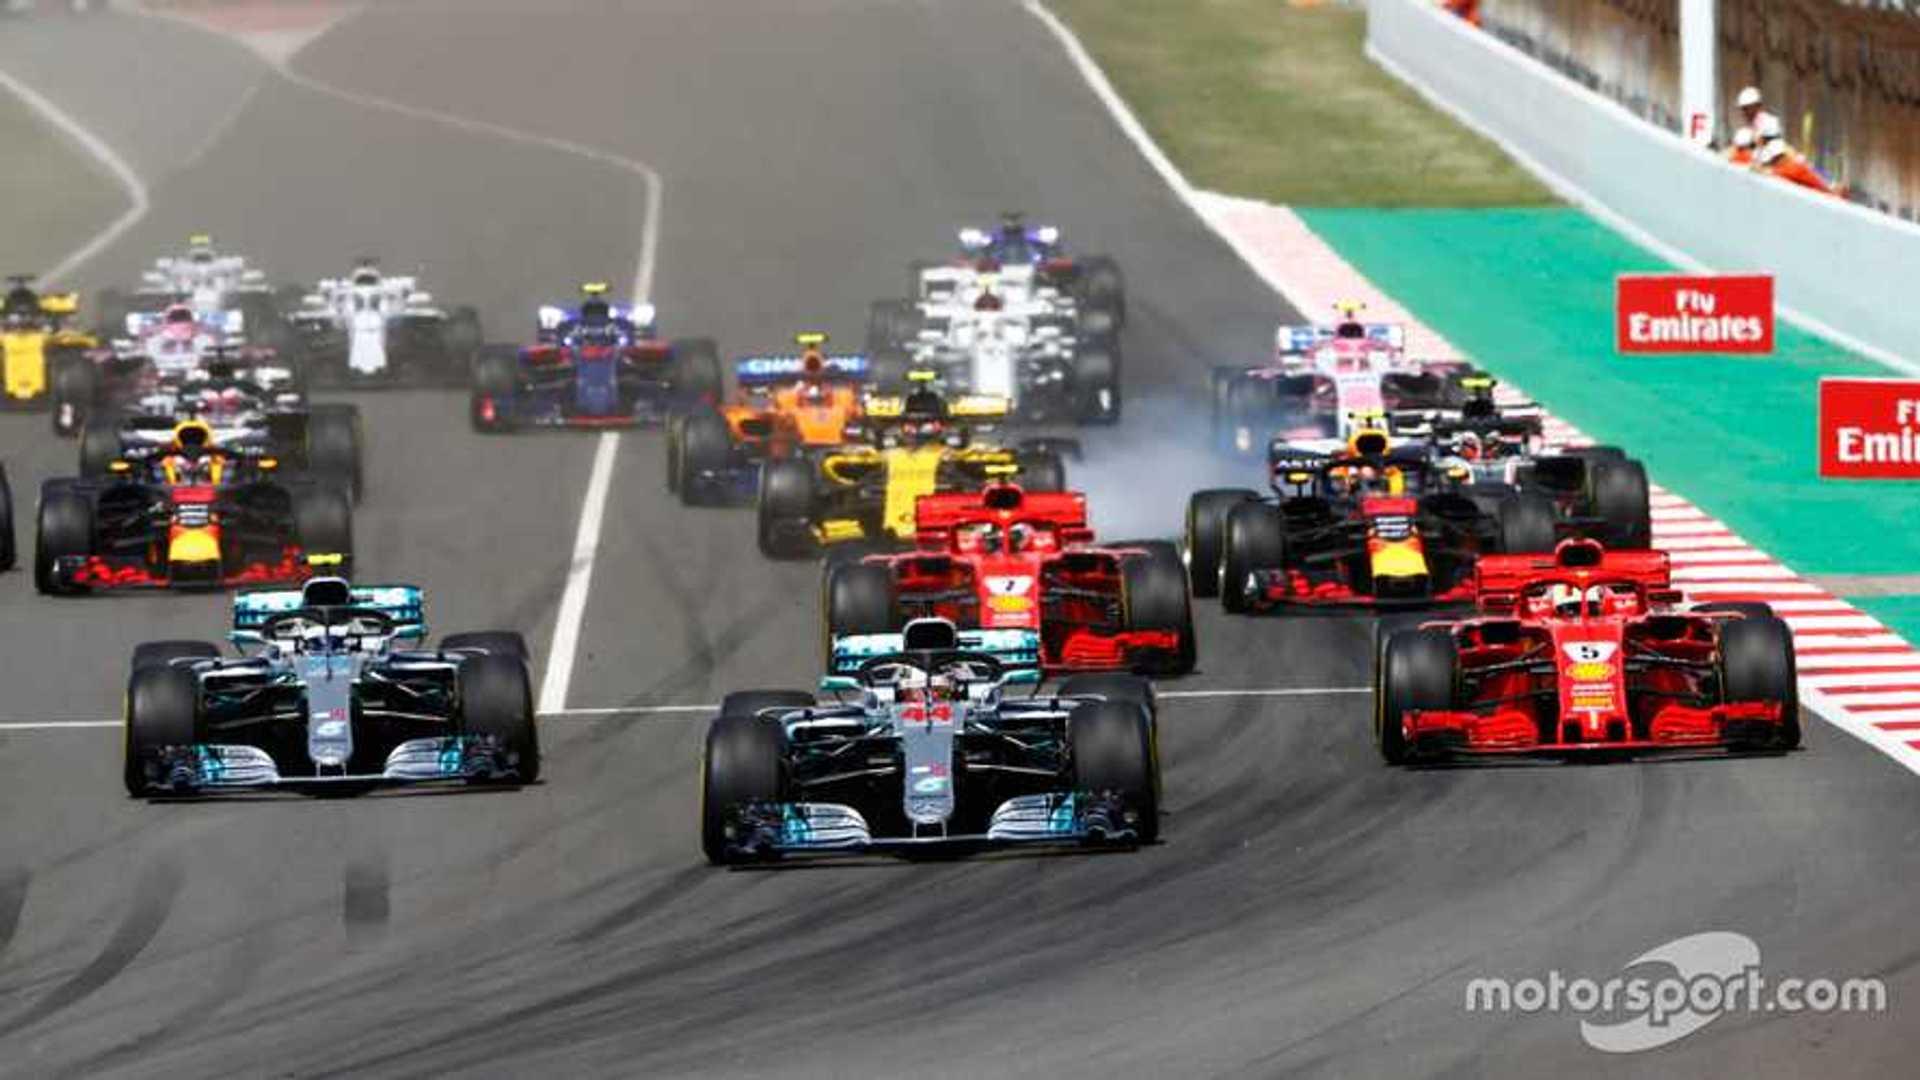 Spanish GP secures 2020 F1 calendar slot